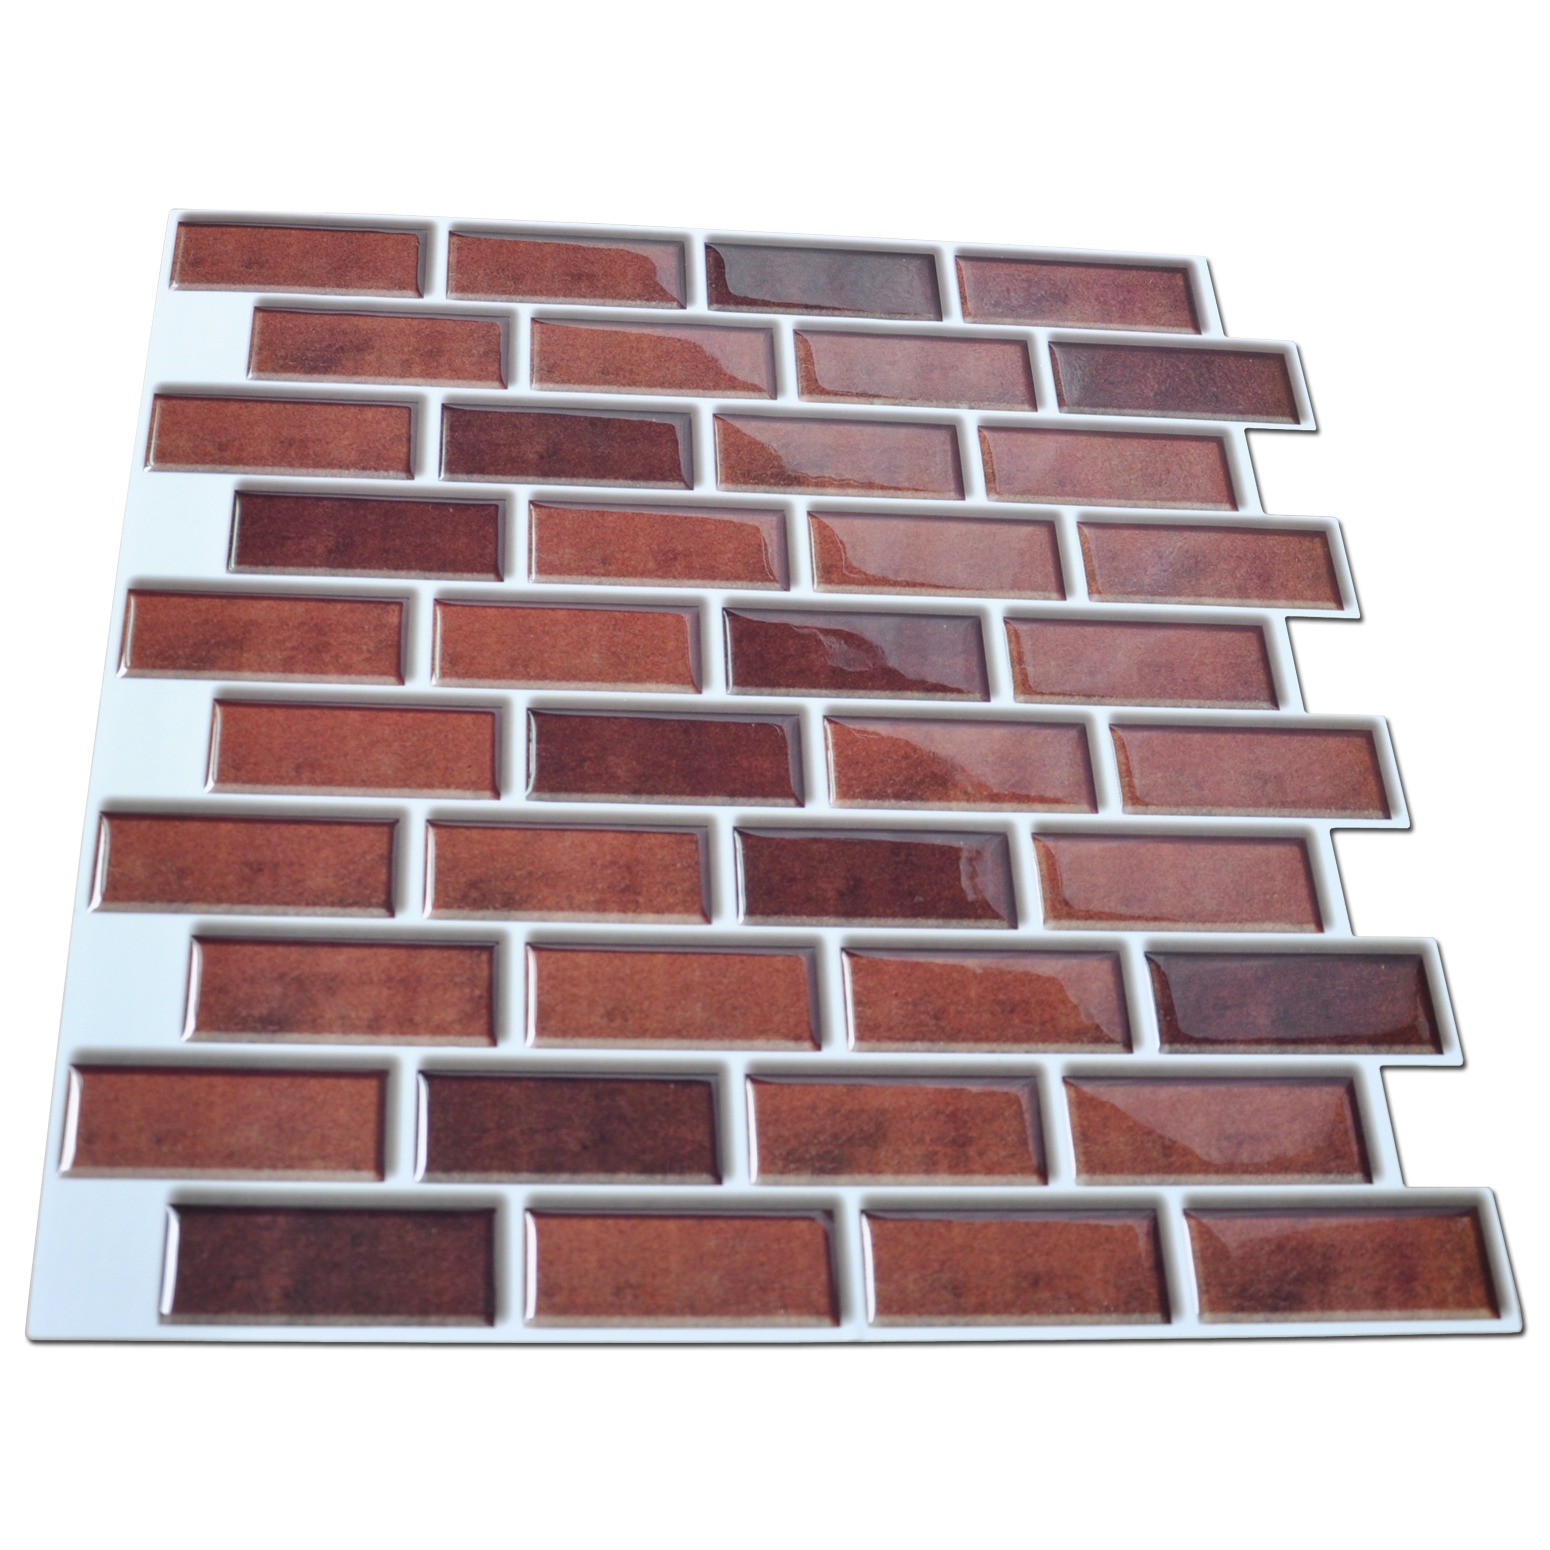 peel and stick brick backsplash tiles kitchen smart tiles 58 sqft 6 pack